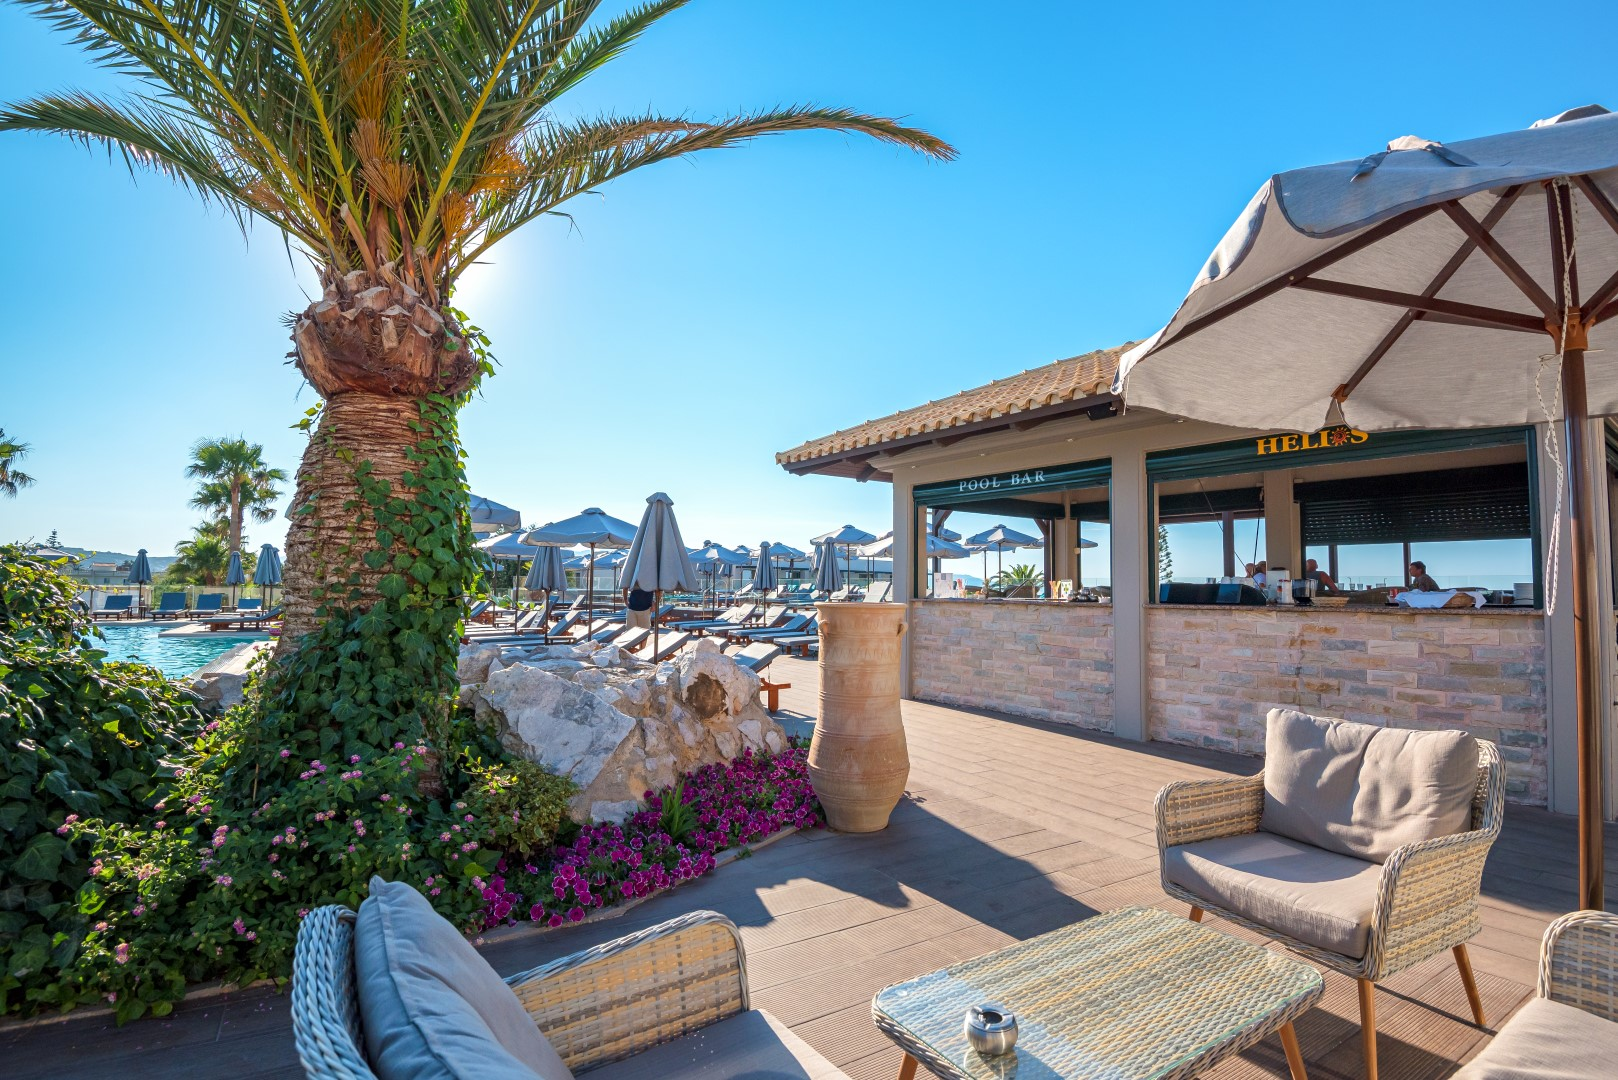 Pool Bar - Roof Garden